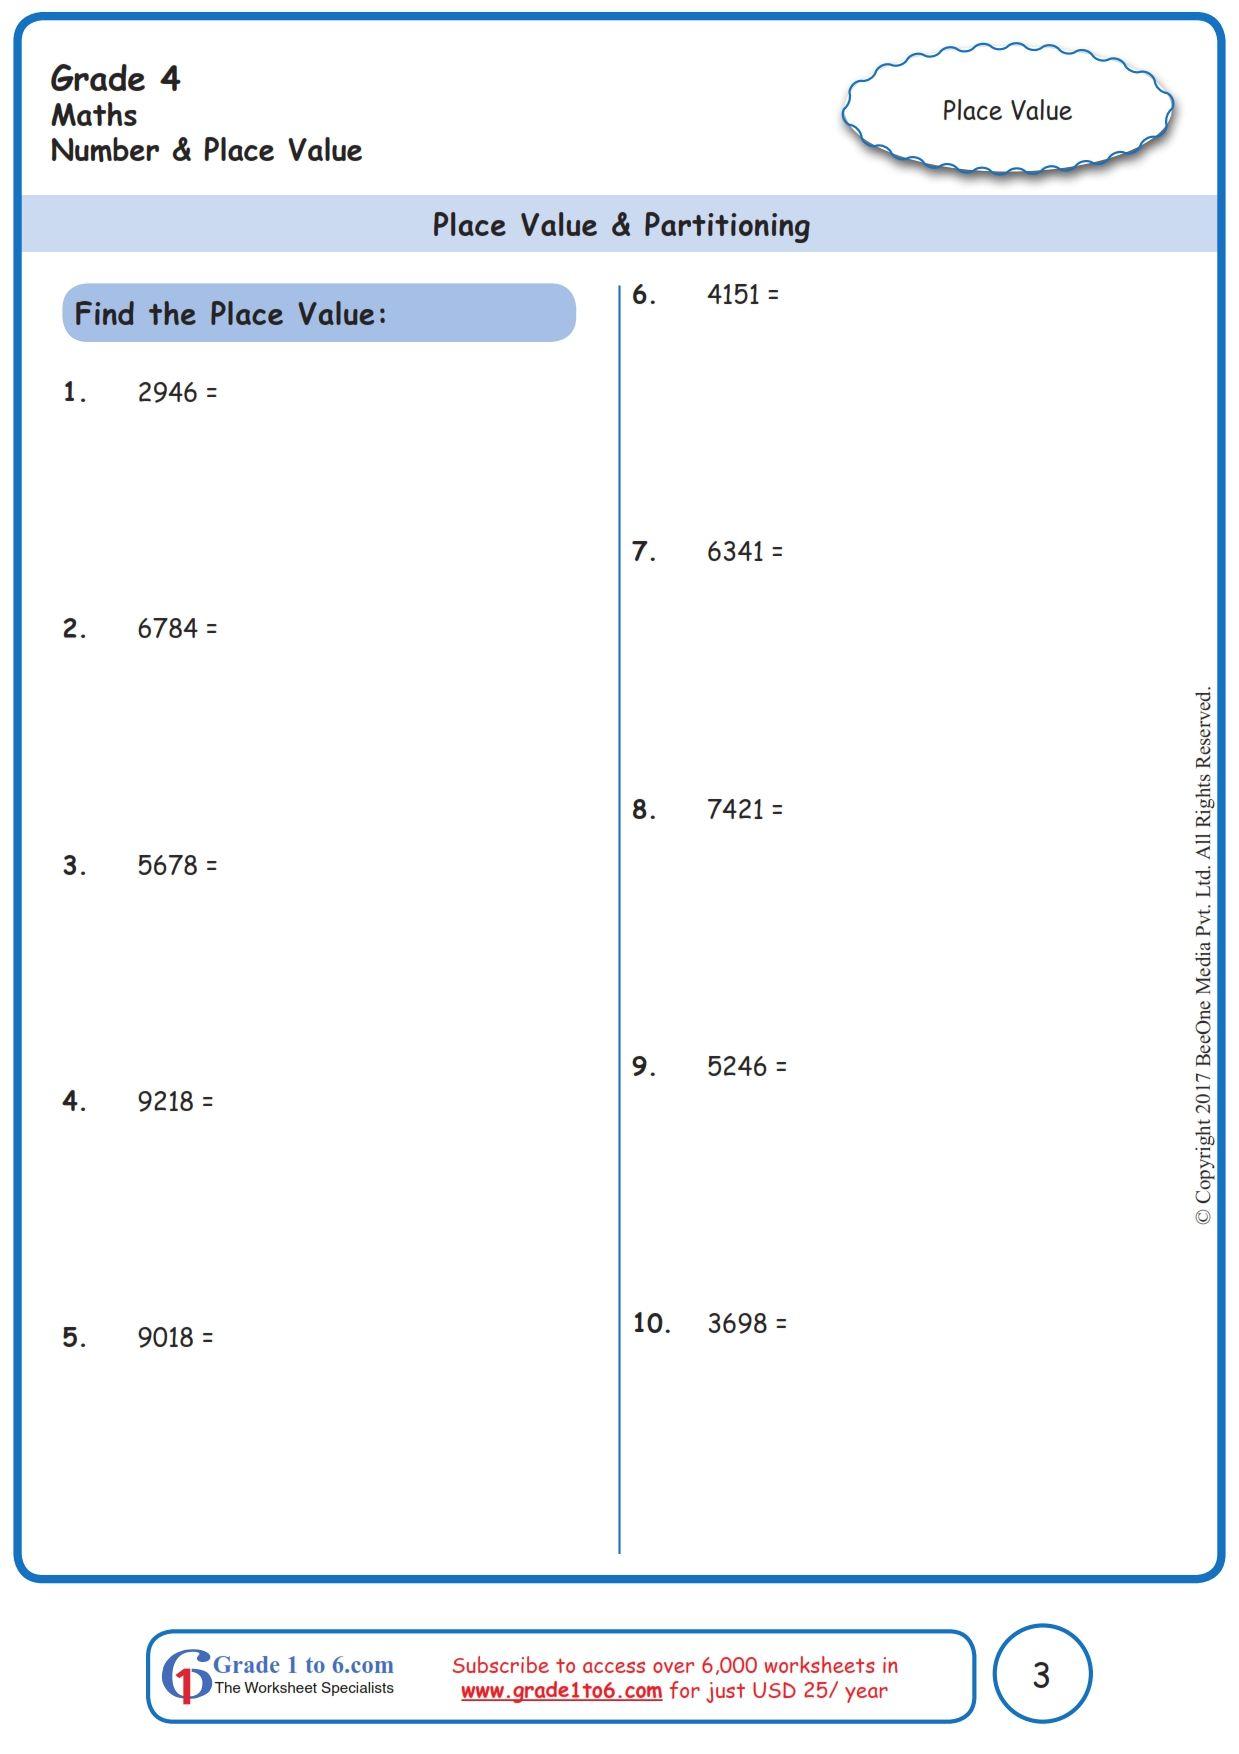 Pin On Grade 4 Math Worksheets Pyp Cbse Icse Common Core [ 1754 x 1239 Pixel ]